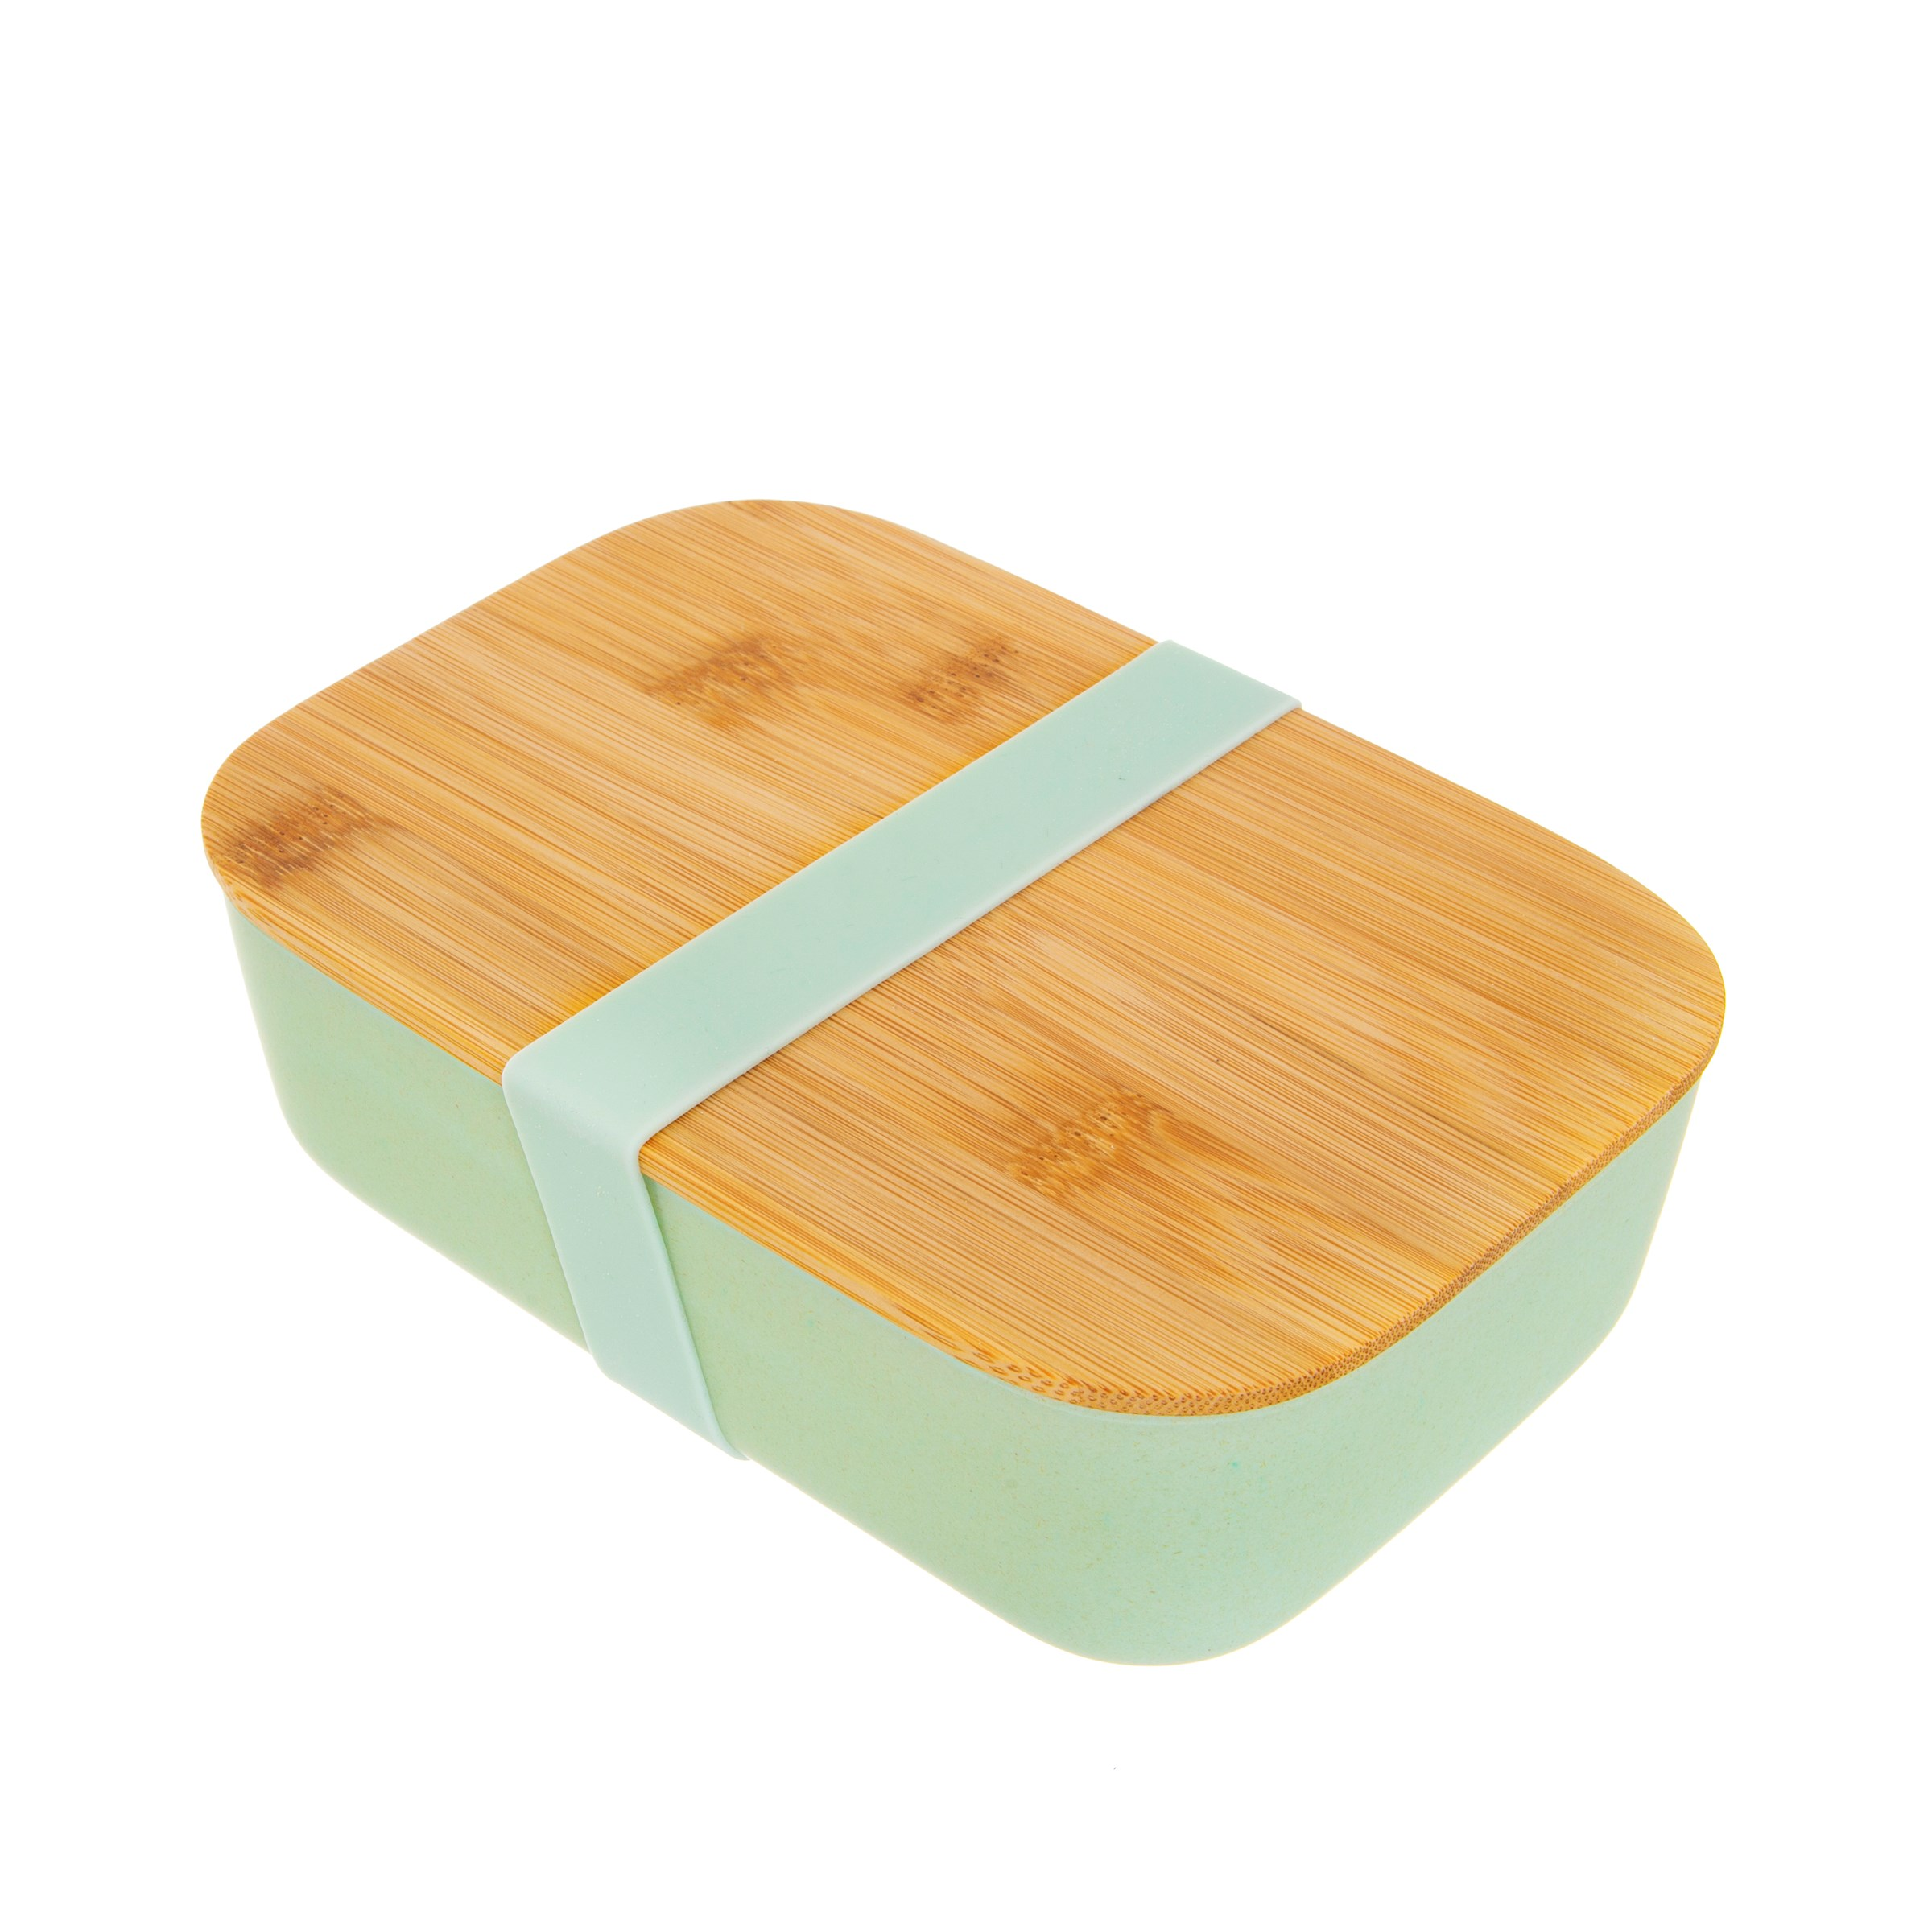 Bamboo Lunch Box - Green